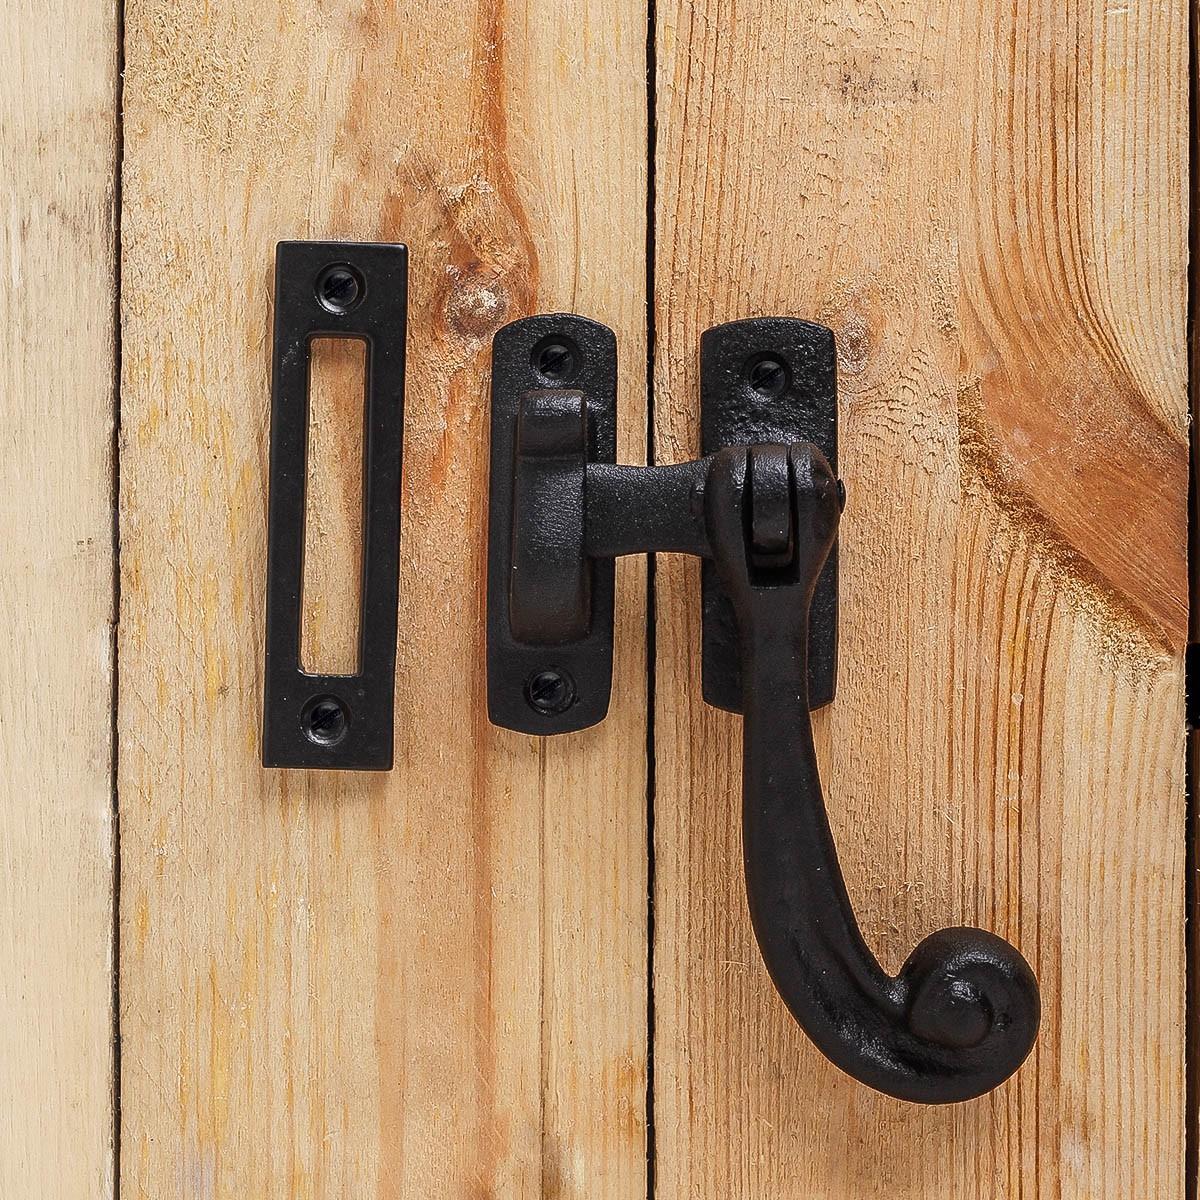 3 Sash Window Door Lock Black Wrought Iron 4 12 Window Pulls Window Lifts Sash Lift